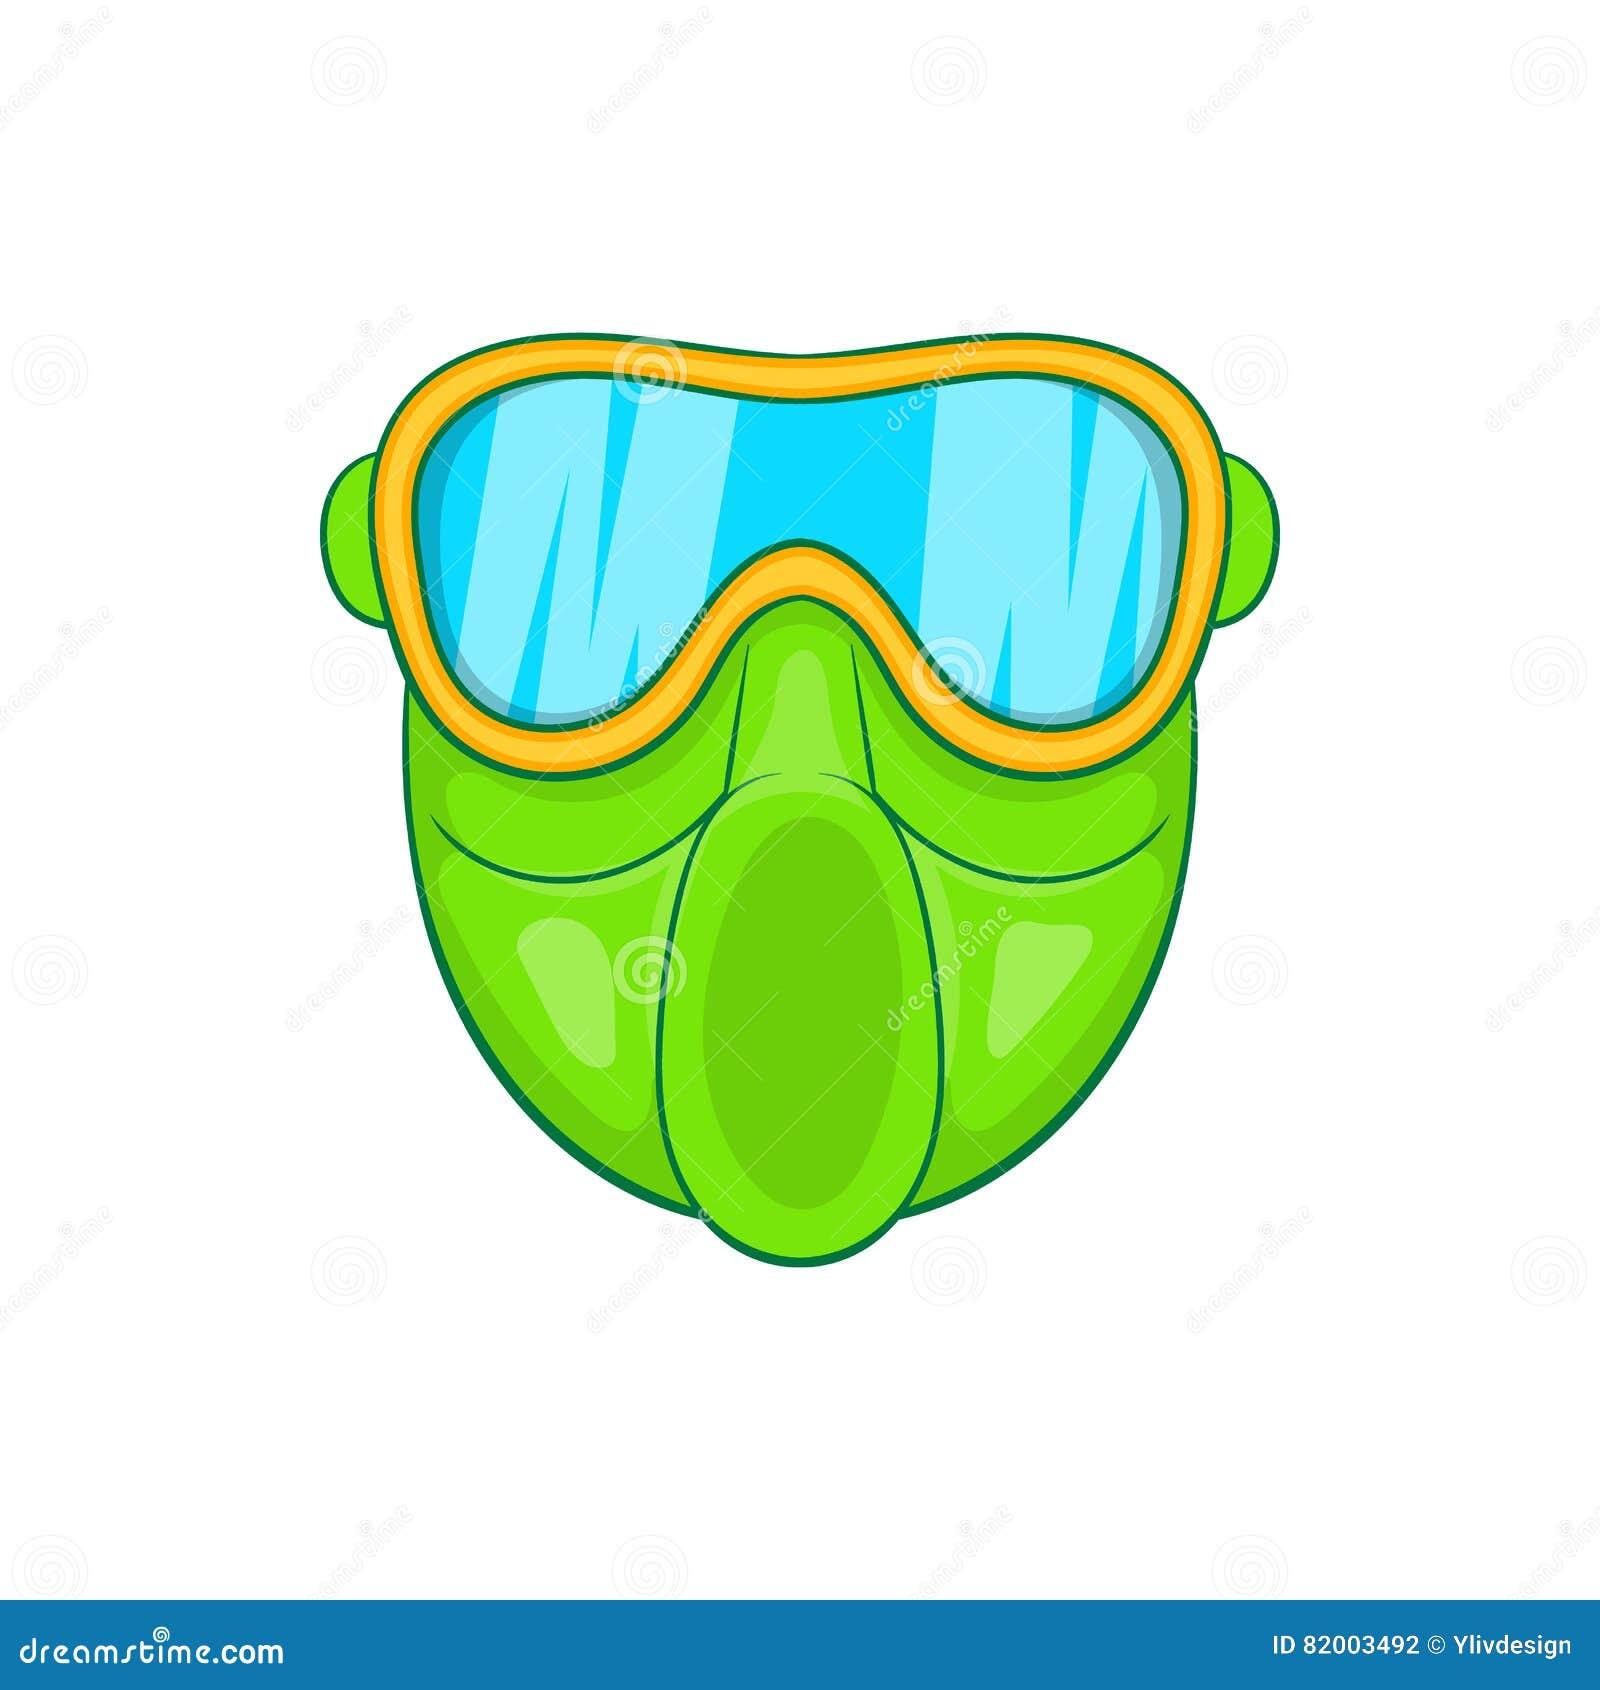 Icône verte de masque de paintball, style de bande dessinée